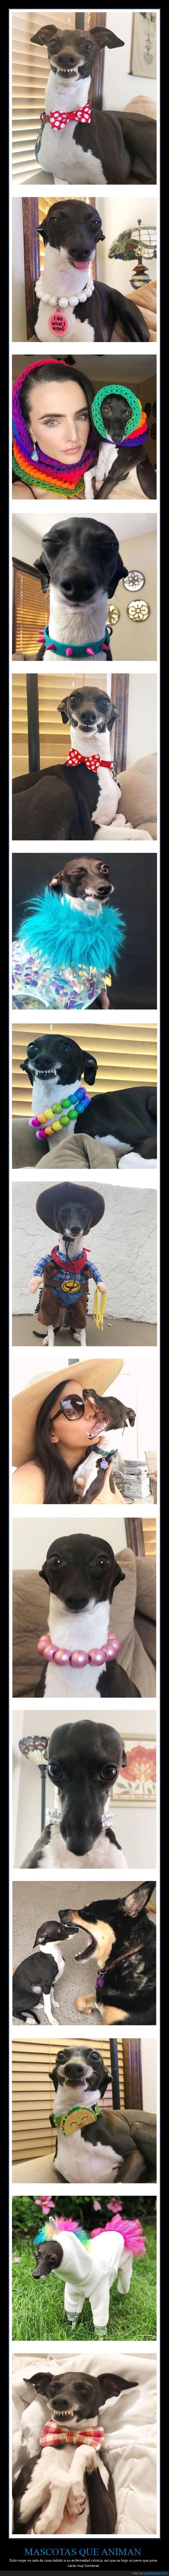 caras,perro